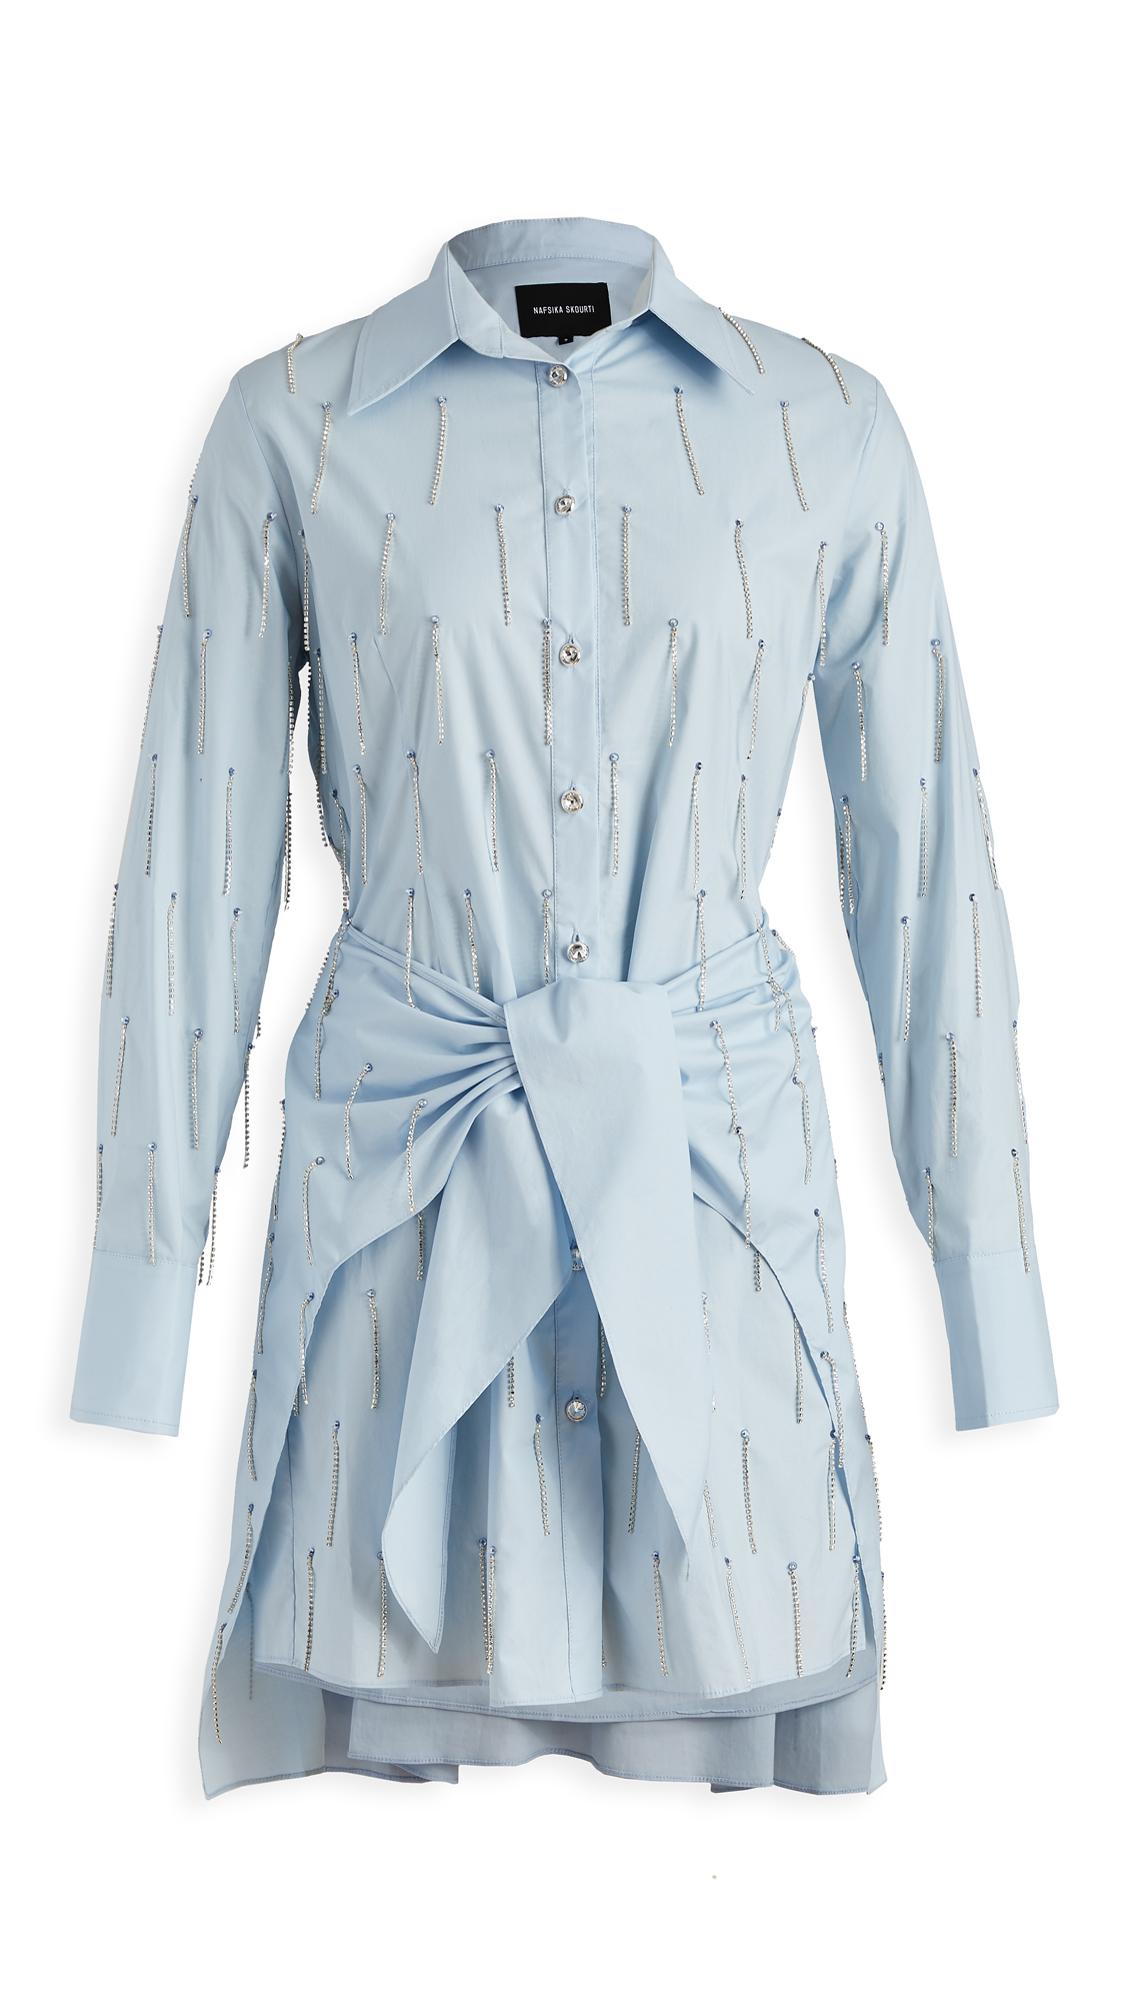 Nafsika Skourti Rio Dress - 30% Off Sale